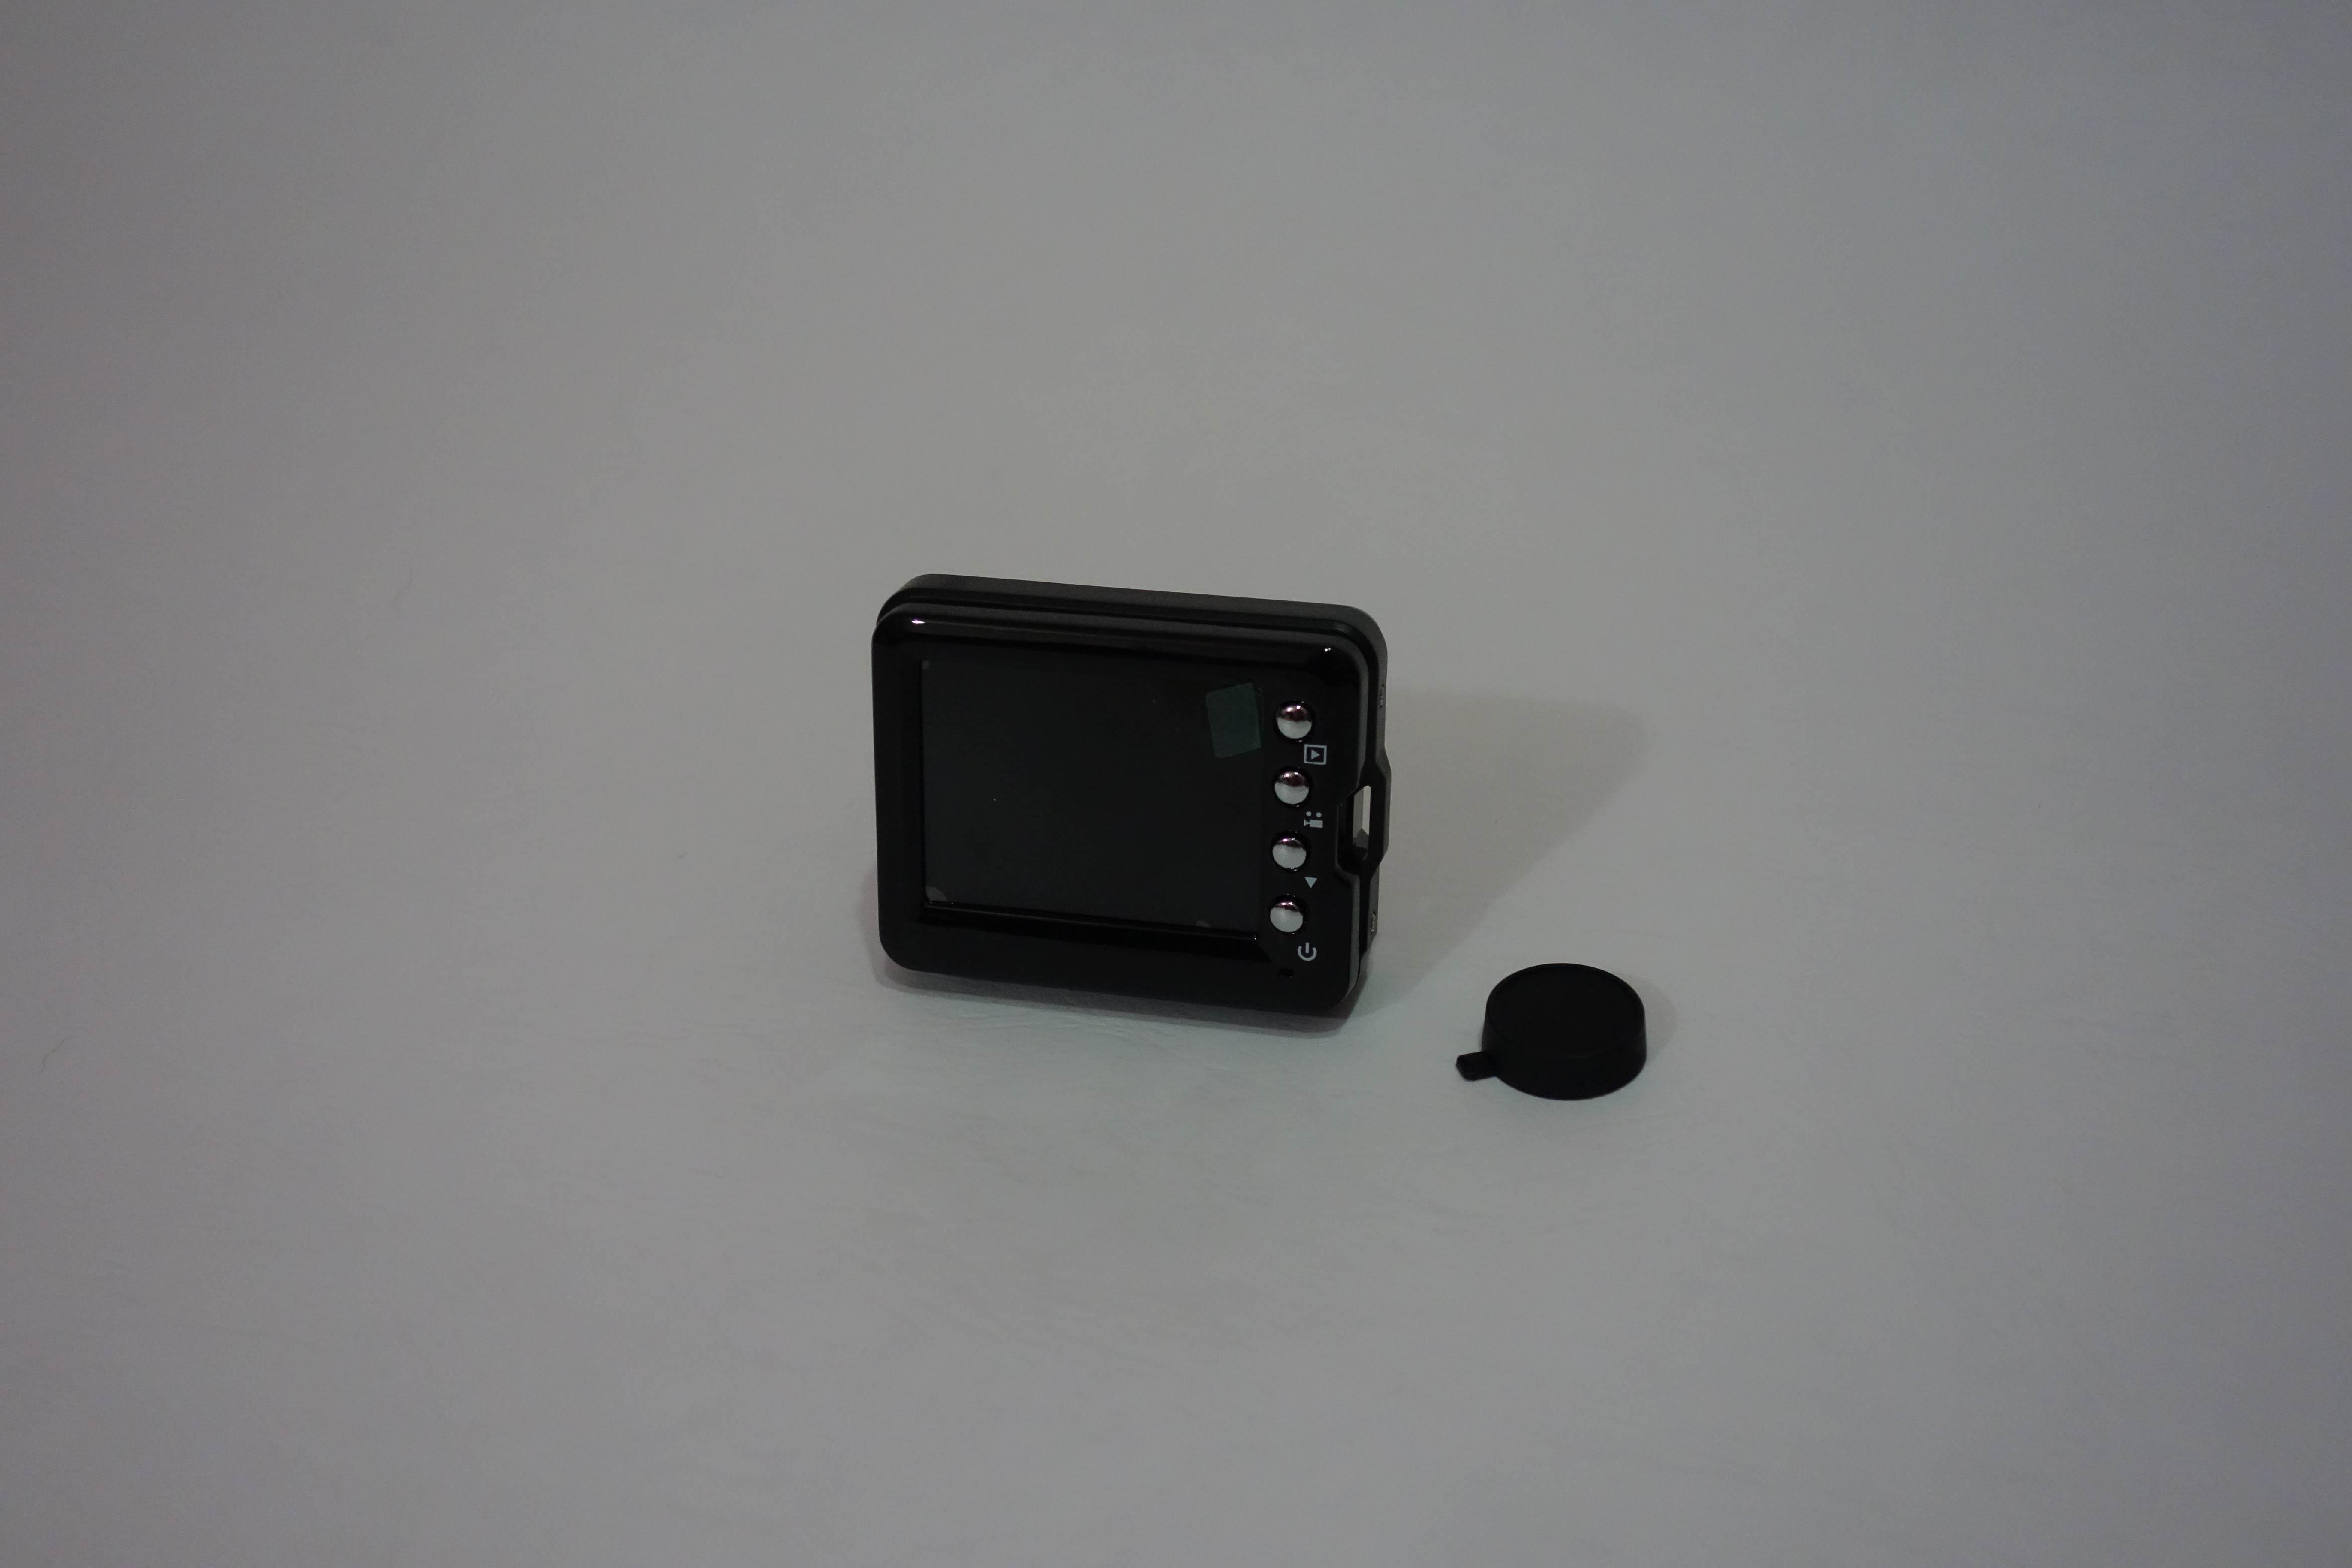 ELK-美商NANO CAMPRO T3頂級版行車紀錄器 1080P FULL HD超強夜拍王 採用聯詠96650夜視處理晶片(保固詳情請參閱商品描述) 4